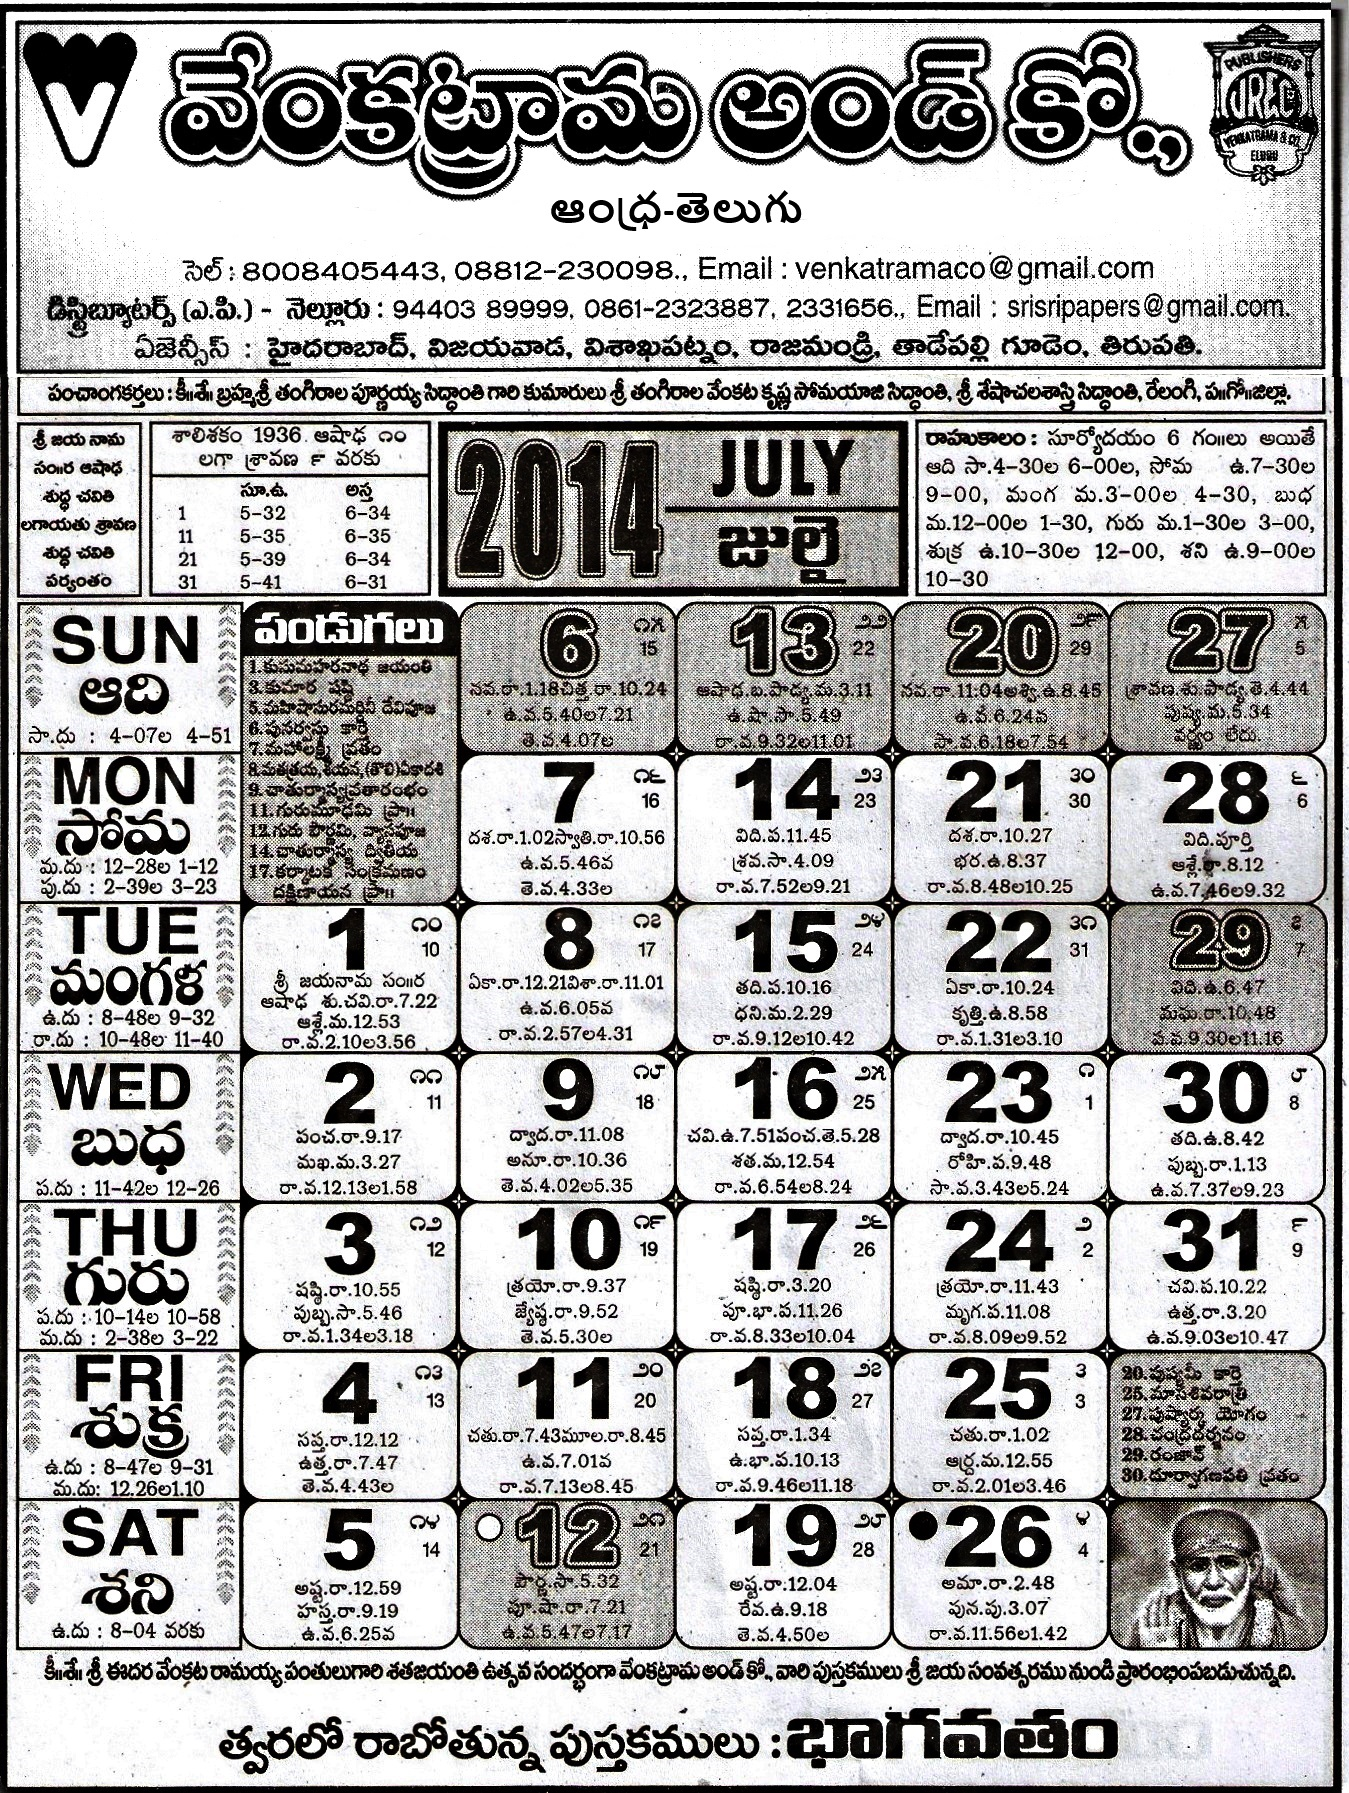 Telugu calendar 2014 august pdf print with festivals & holidays list.